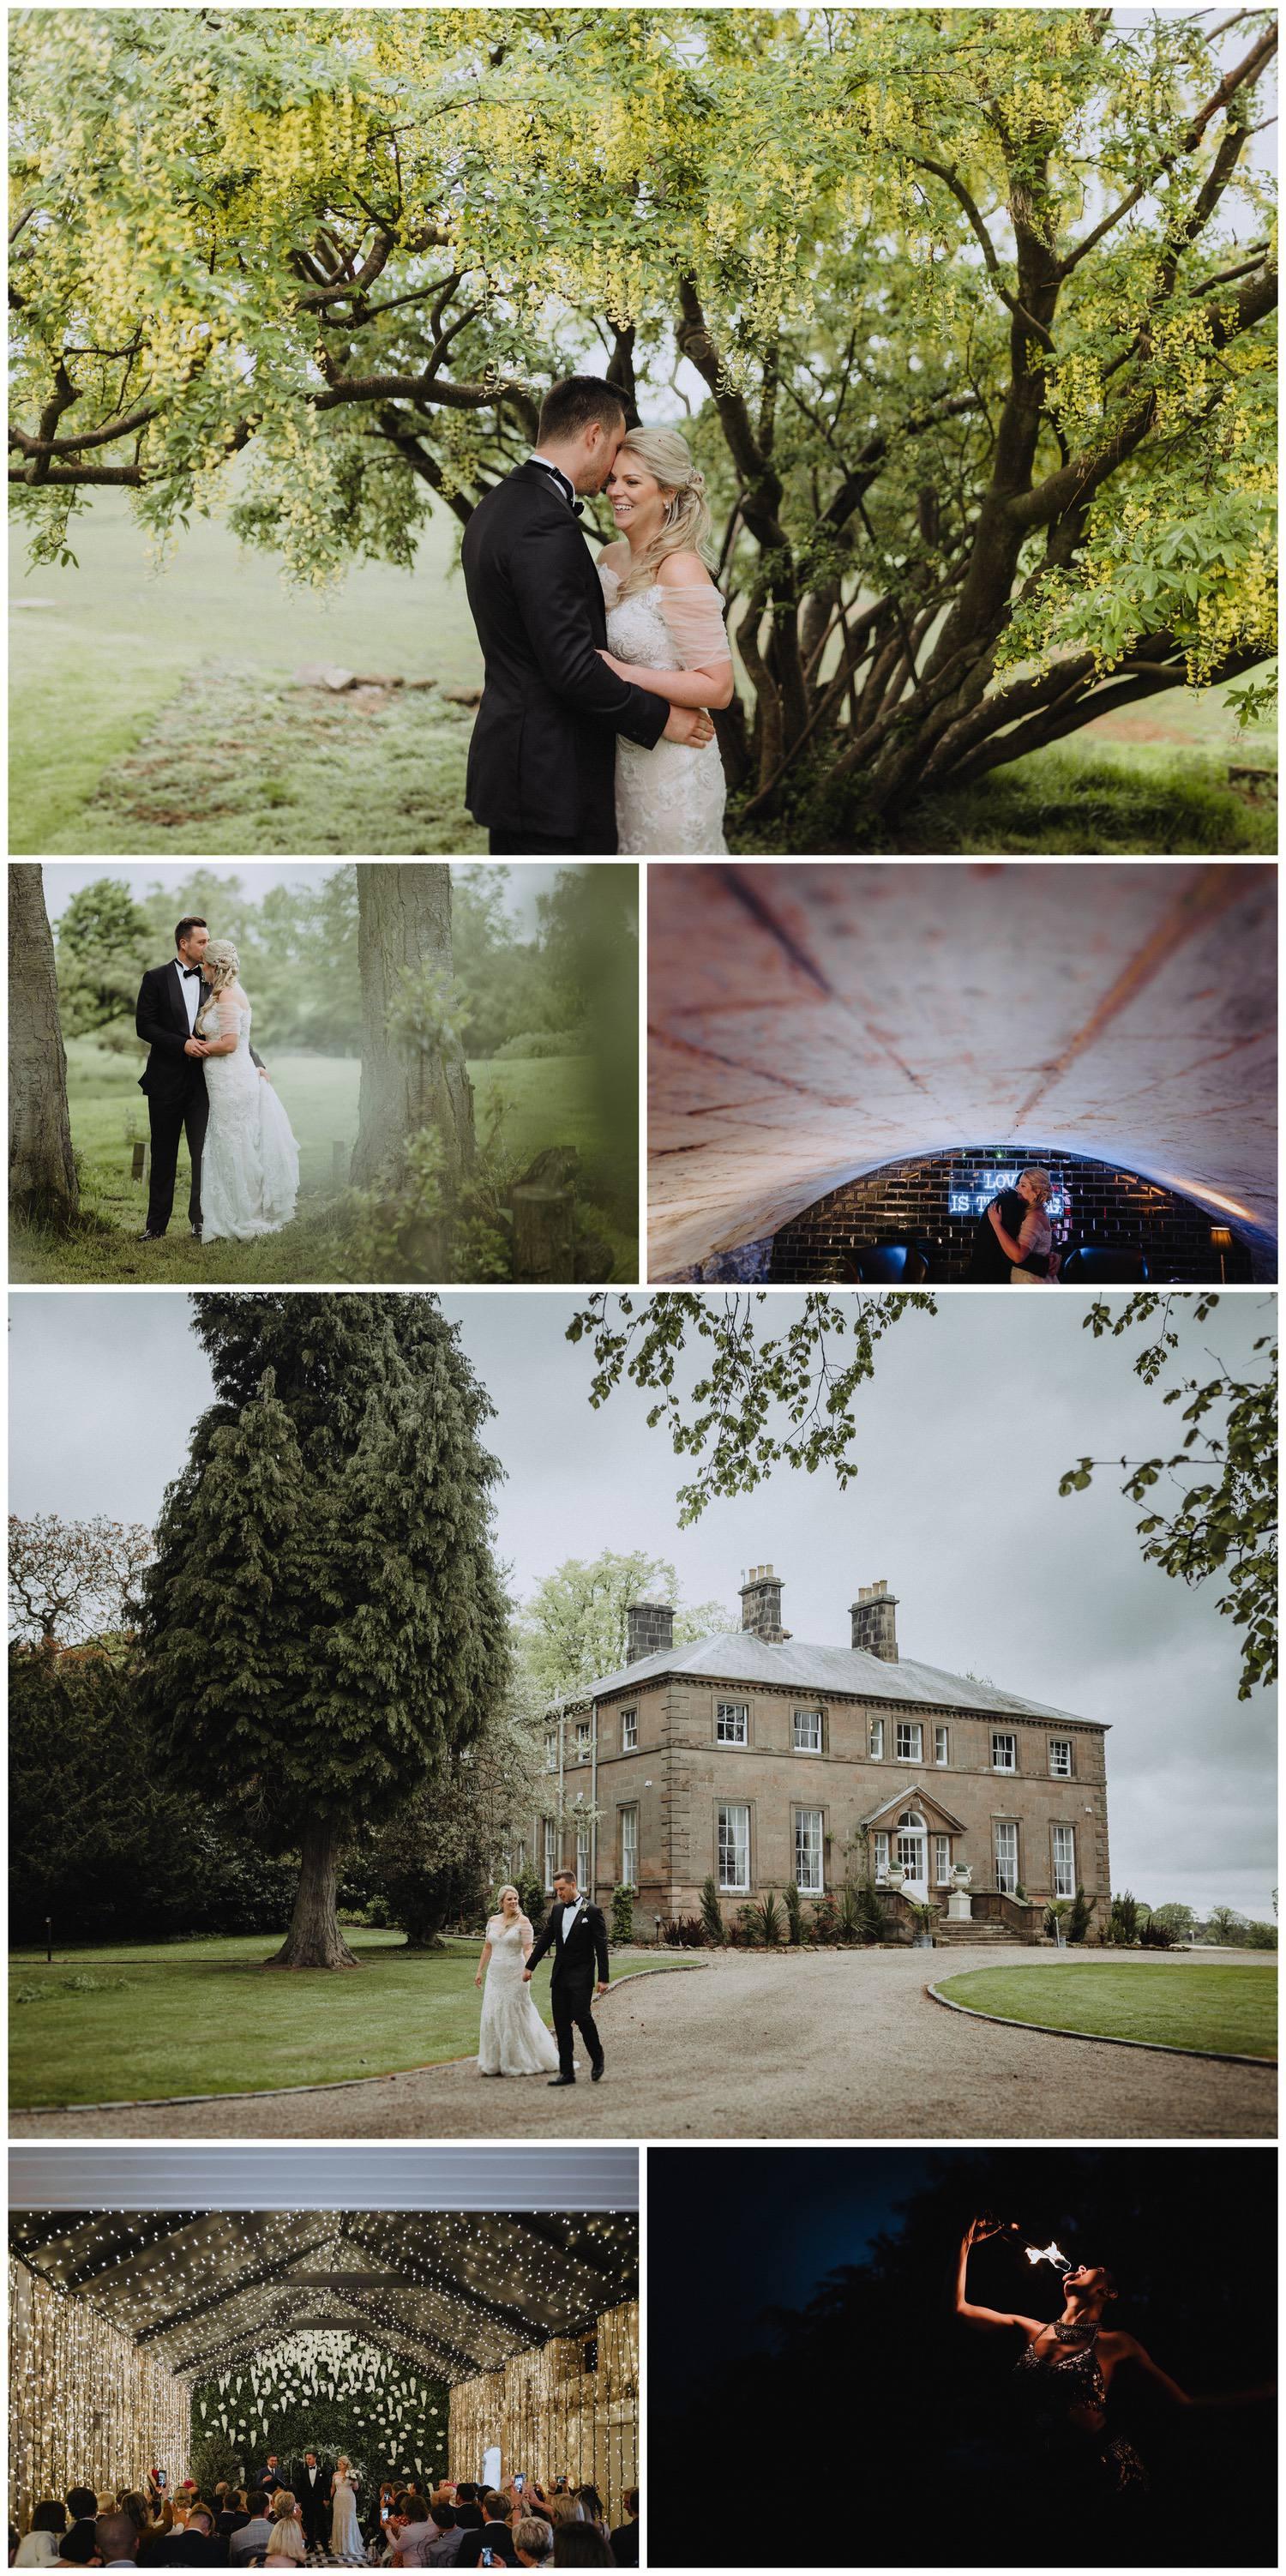 Charlton-Hall-Photography-Paul-Liddement-Wedding-Stories.jpg